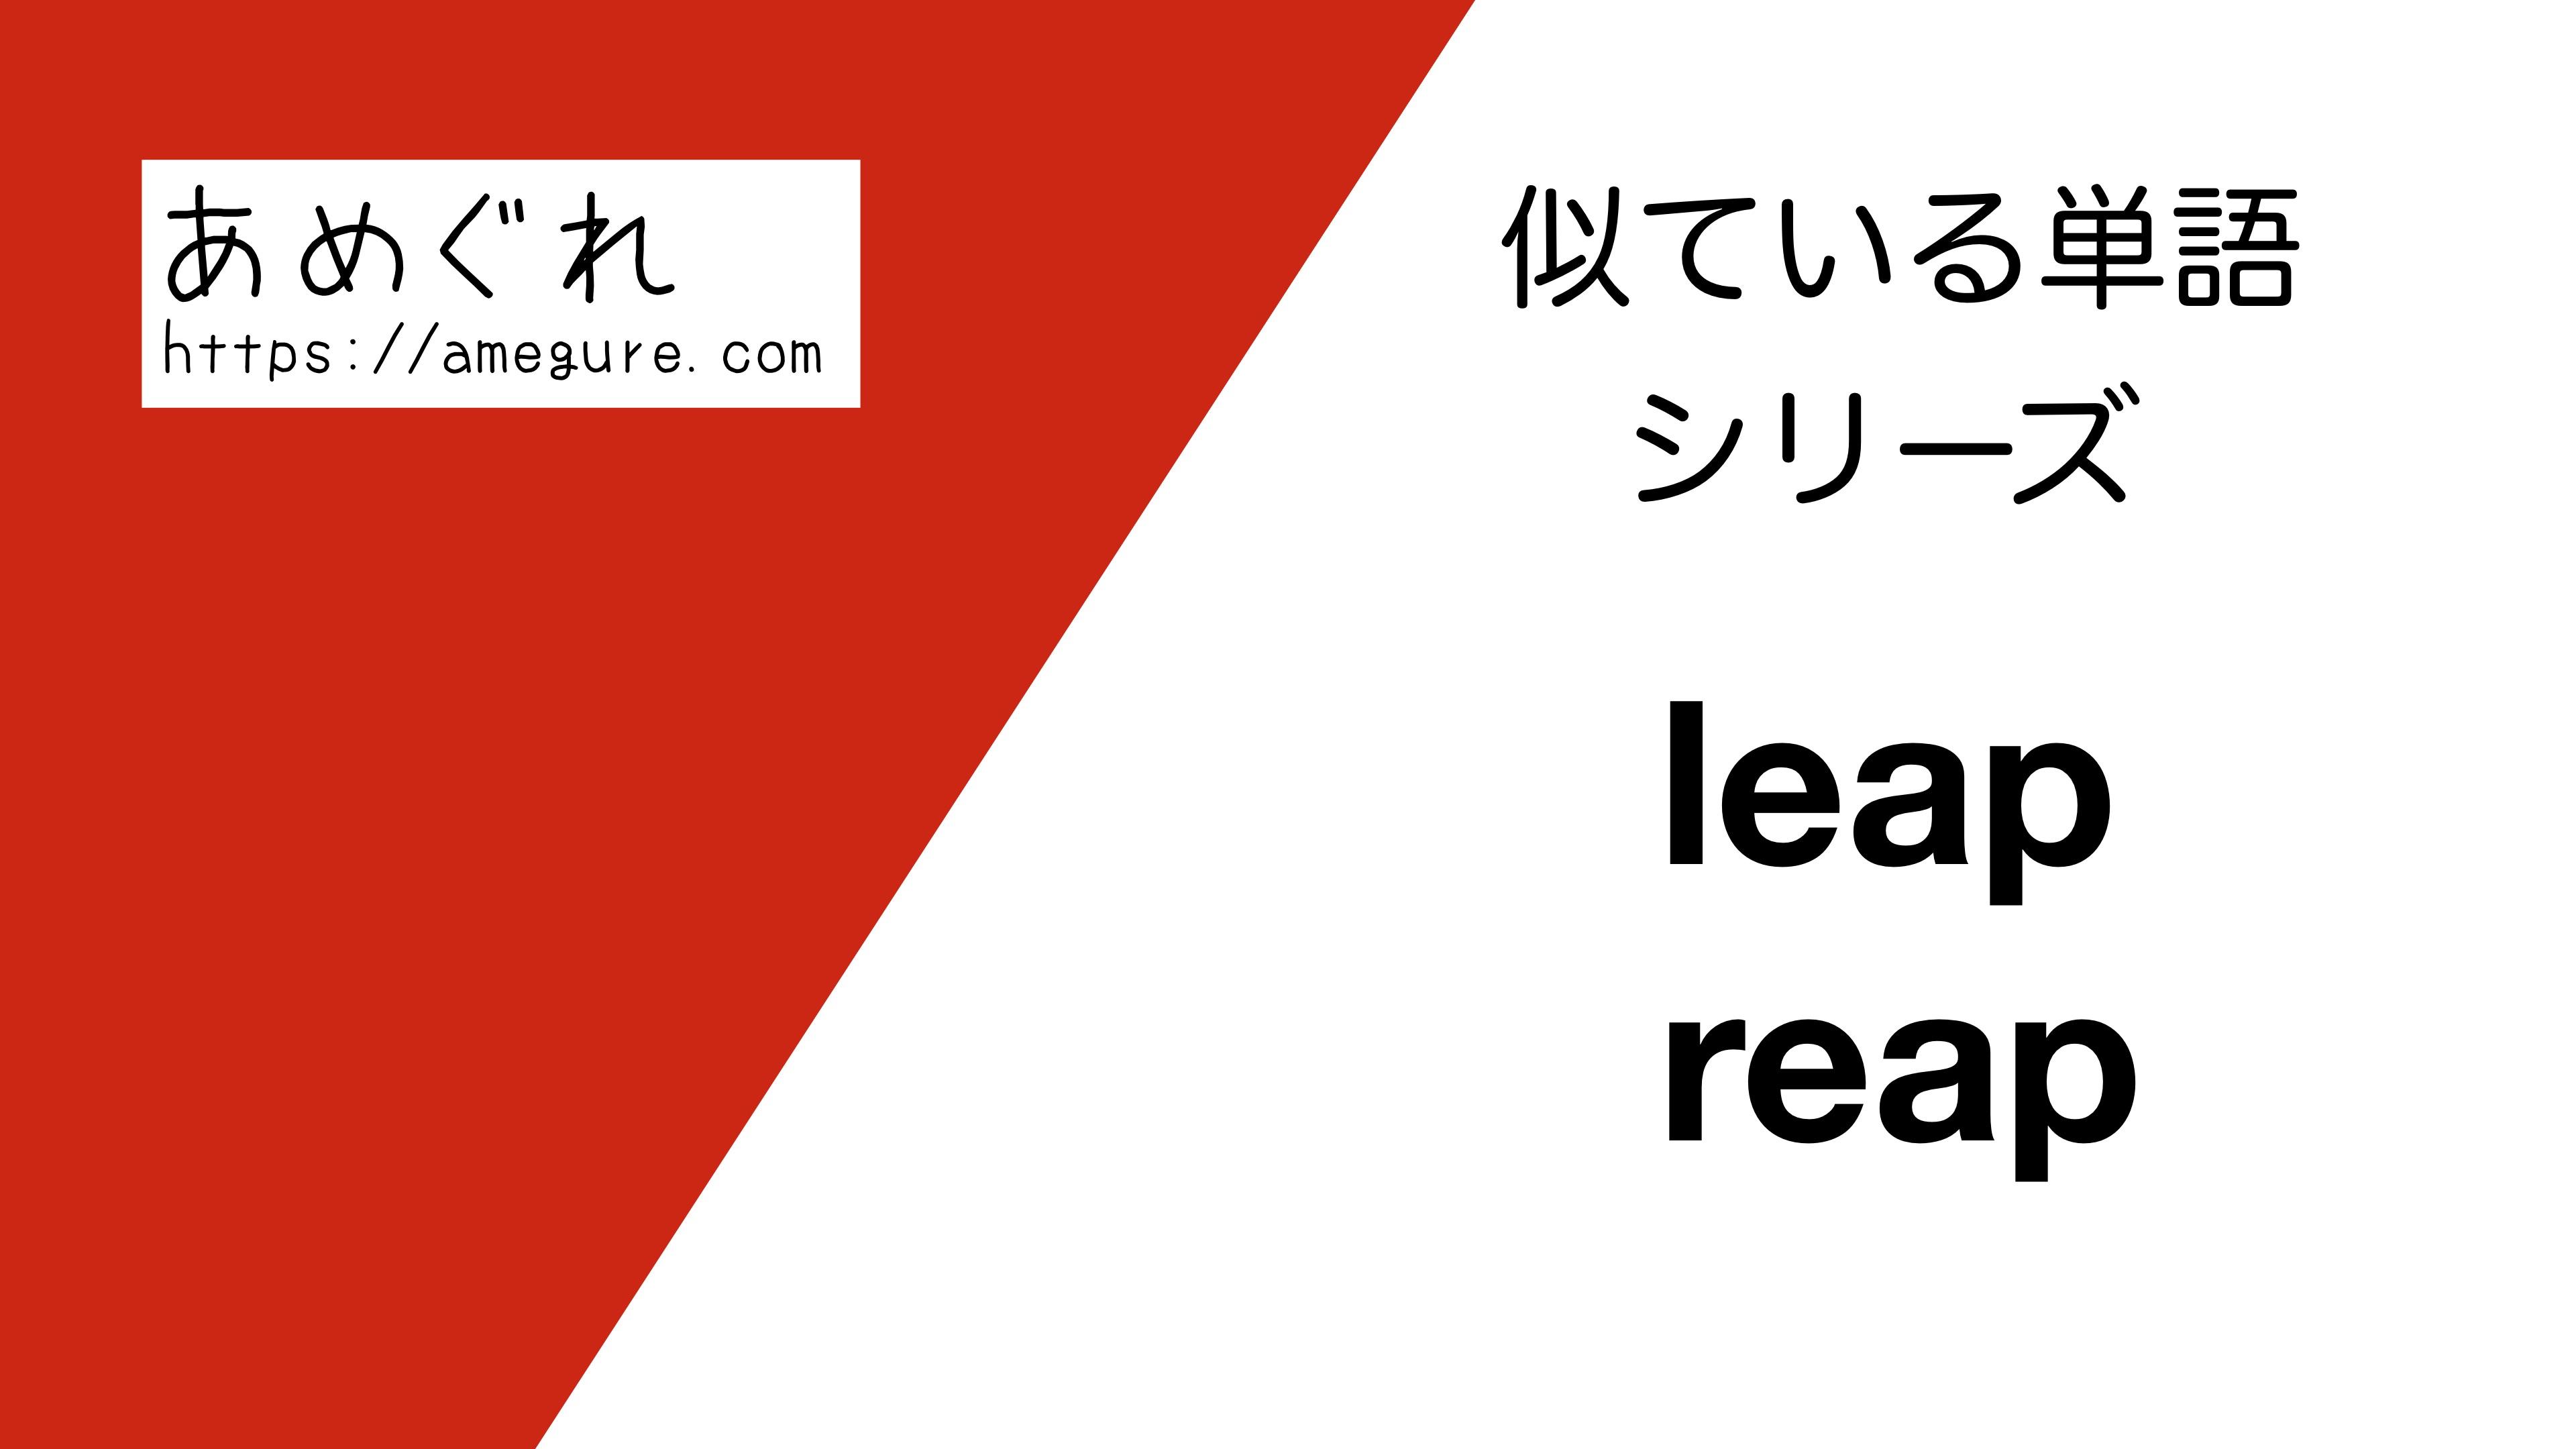 leap-reap違い